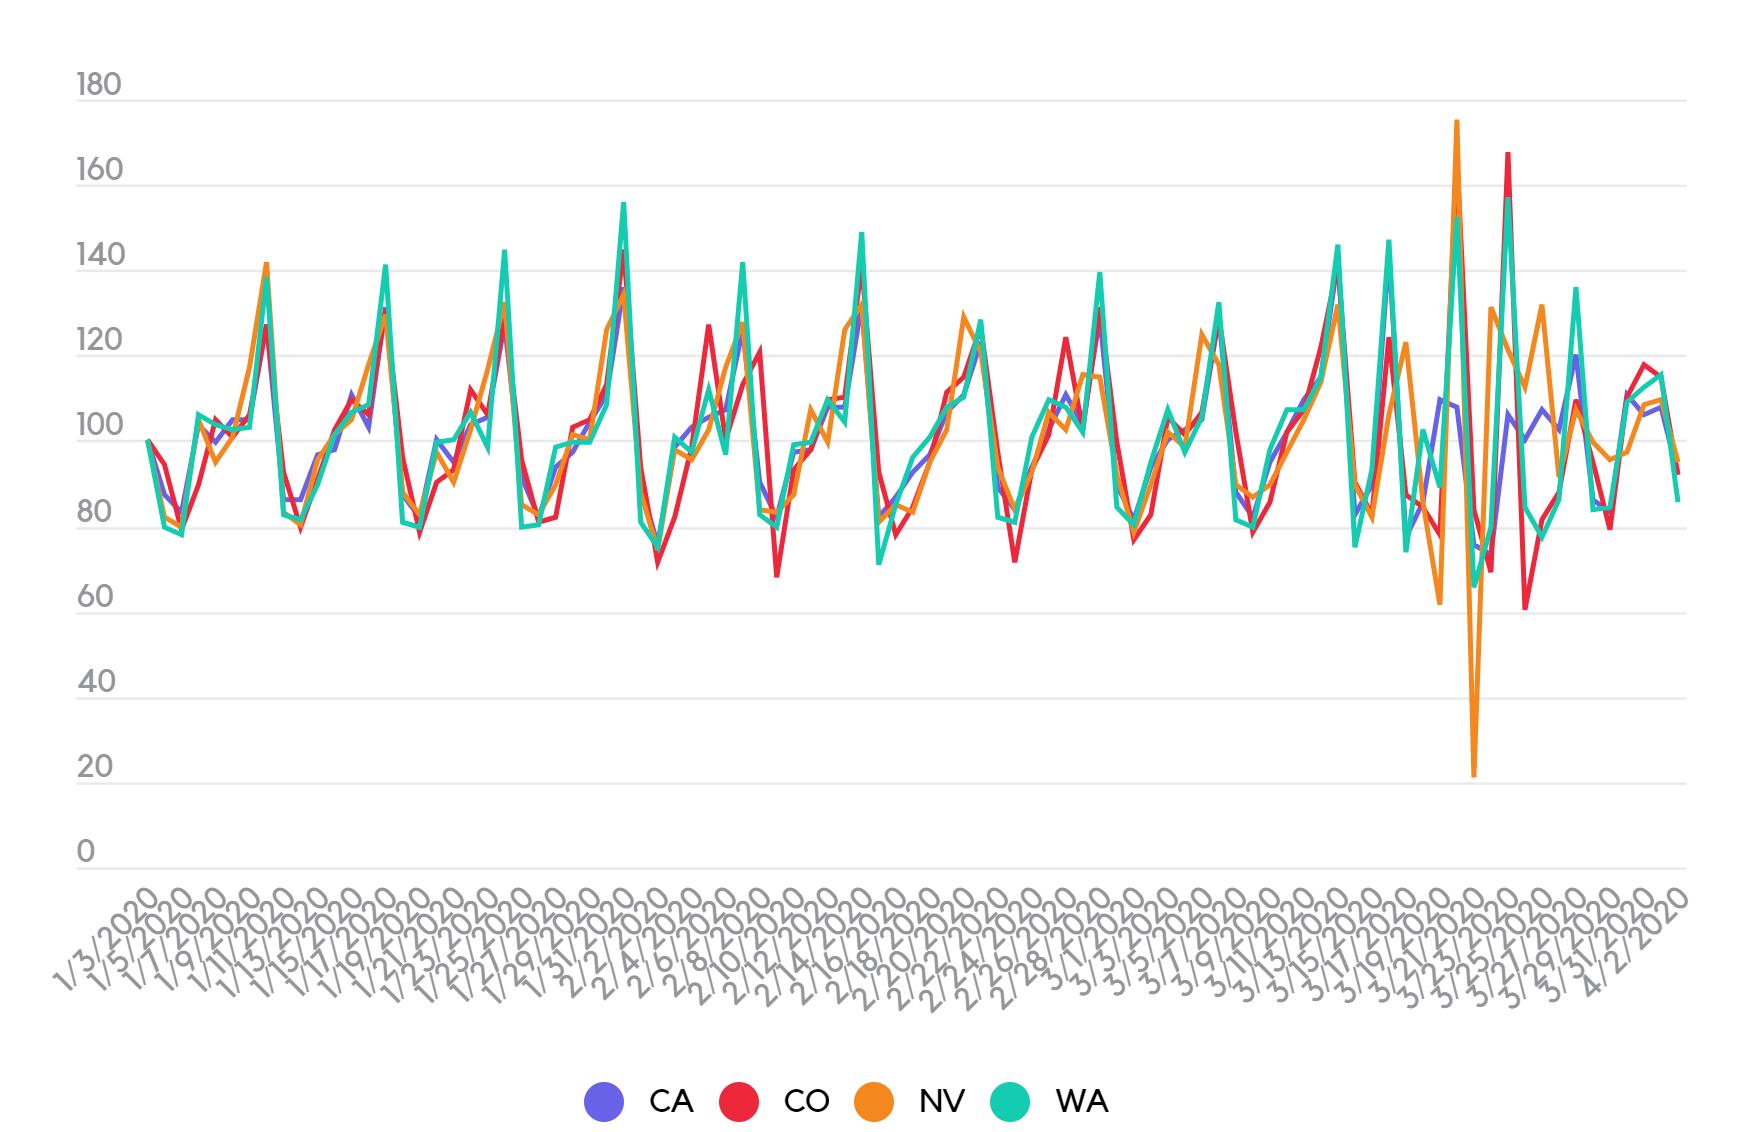 Seasonal patterns in cannabis sales durning Covid-19